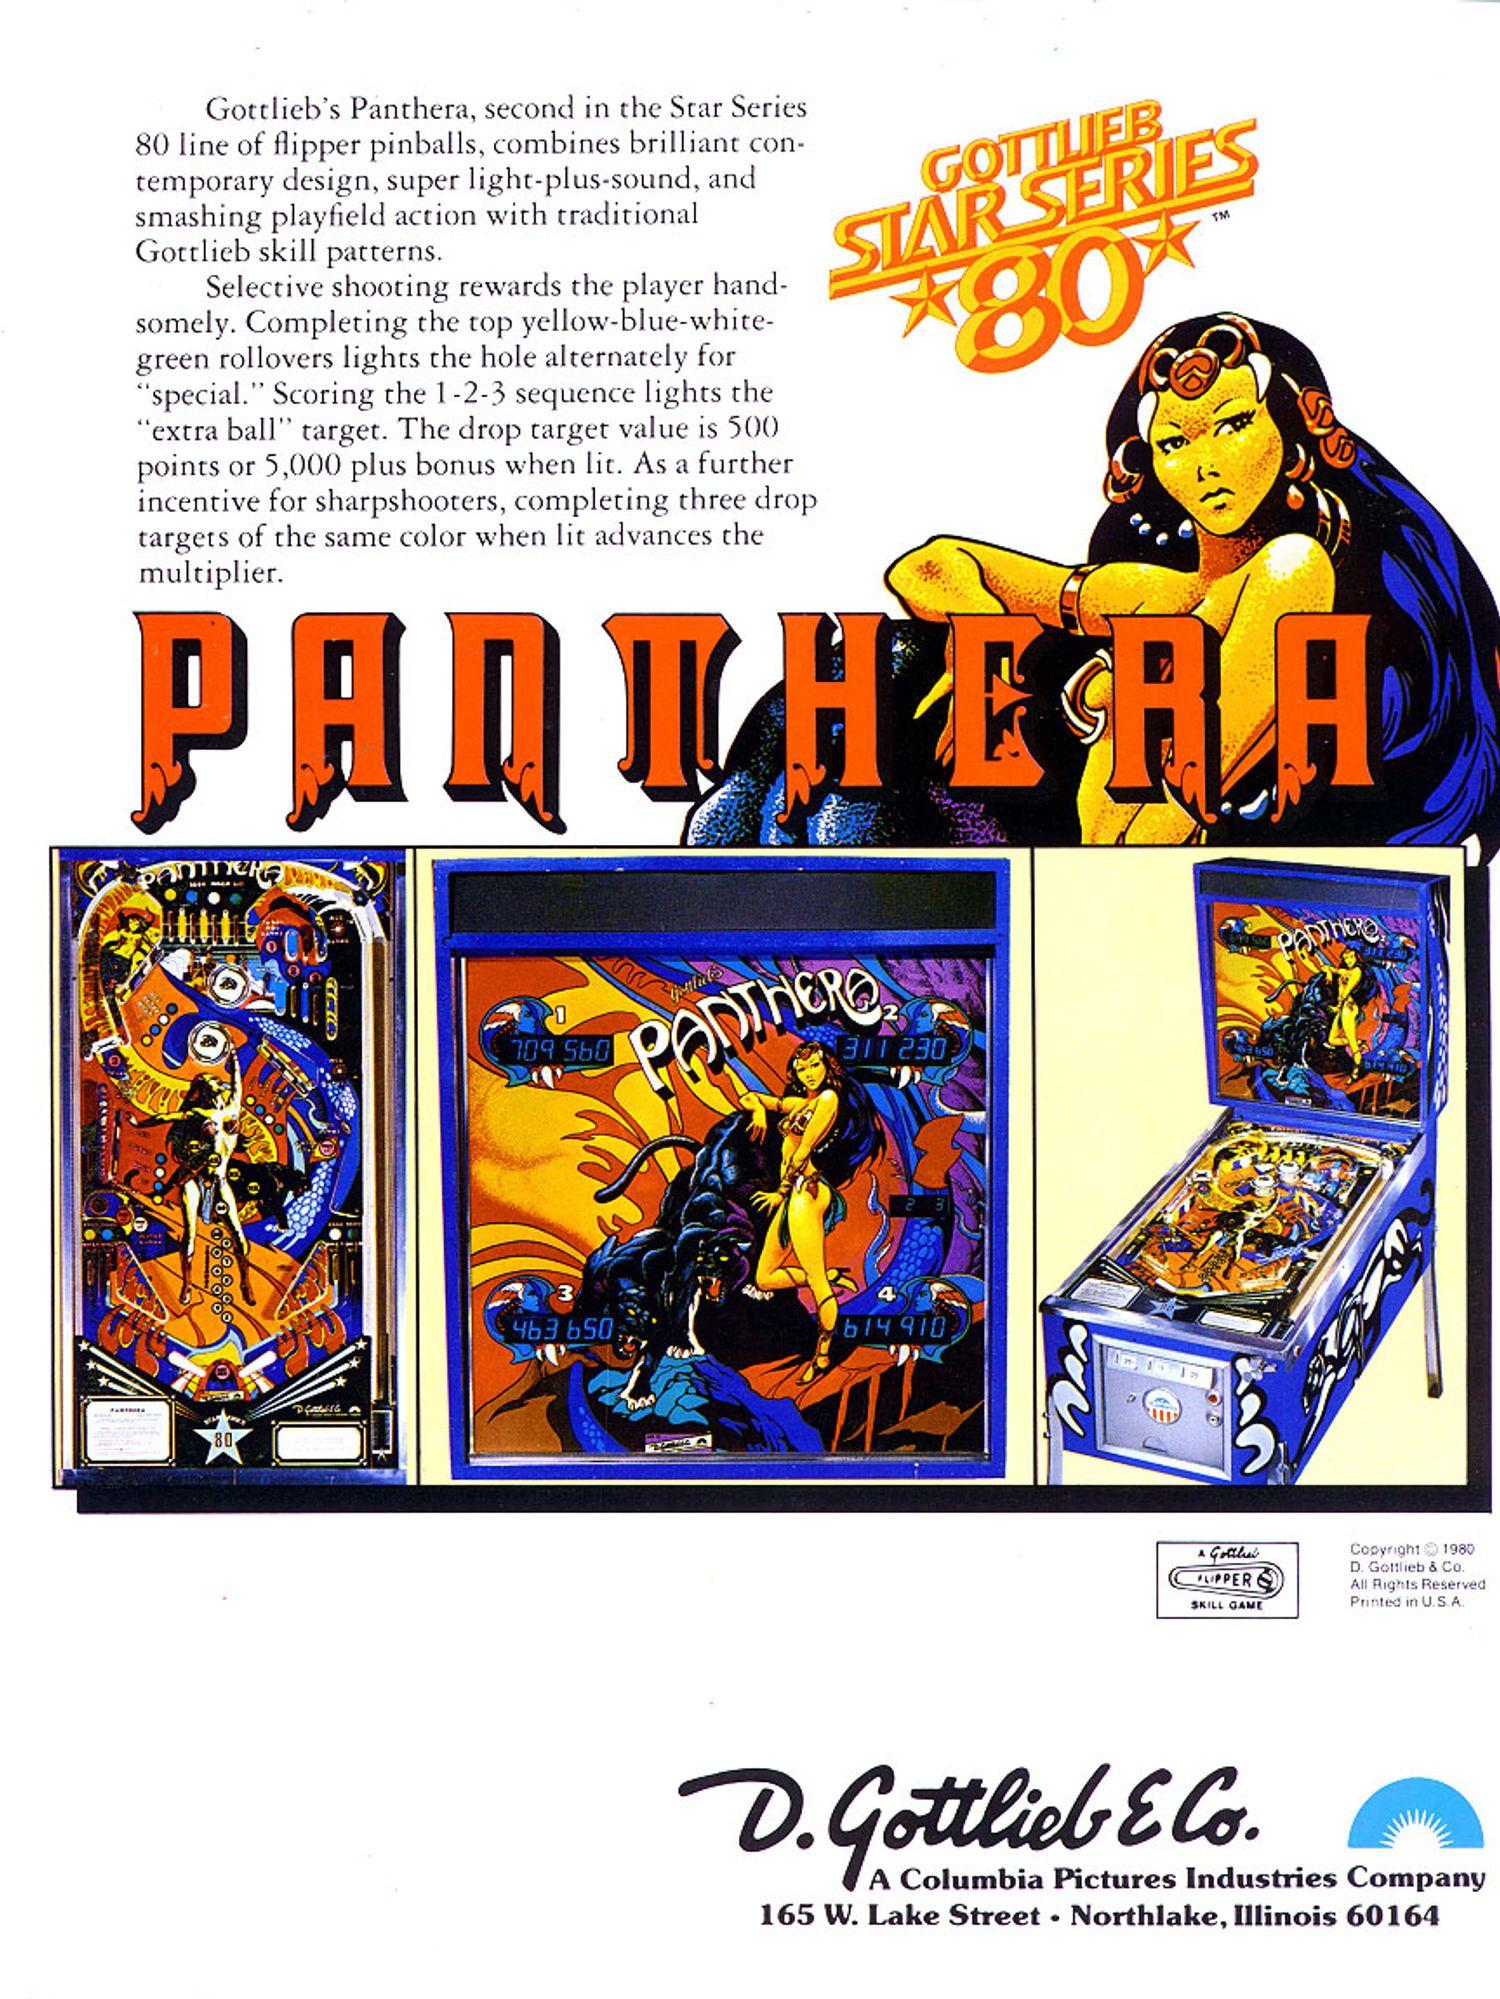 Panthera Flyer back